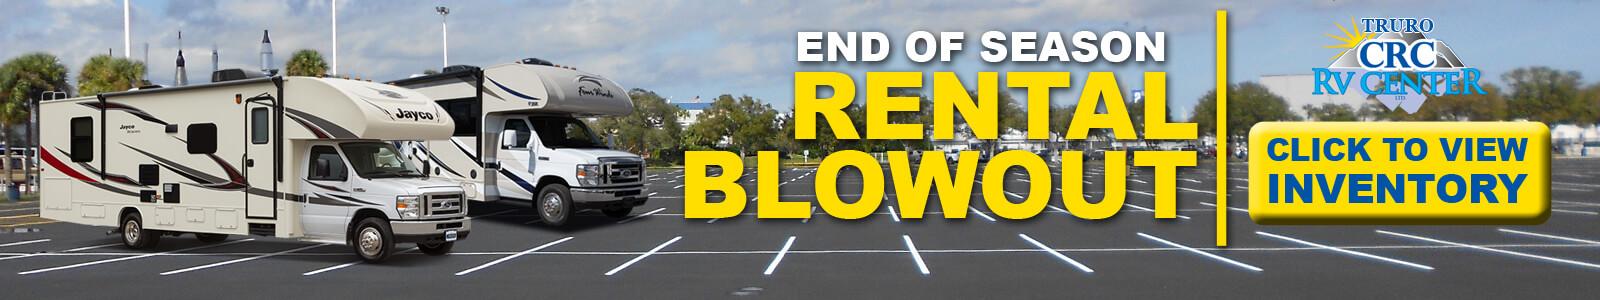 CRC Rental Blowout